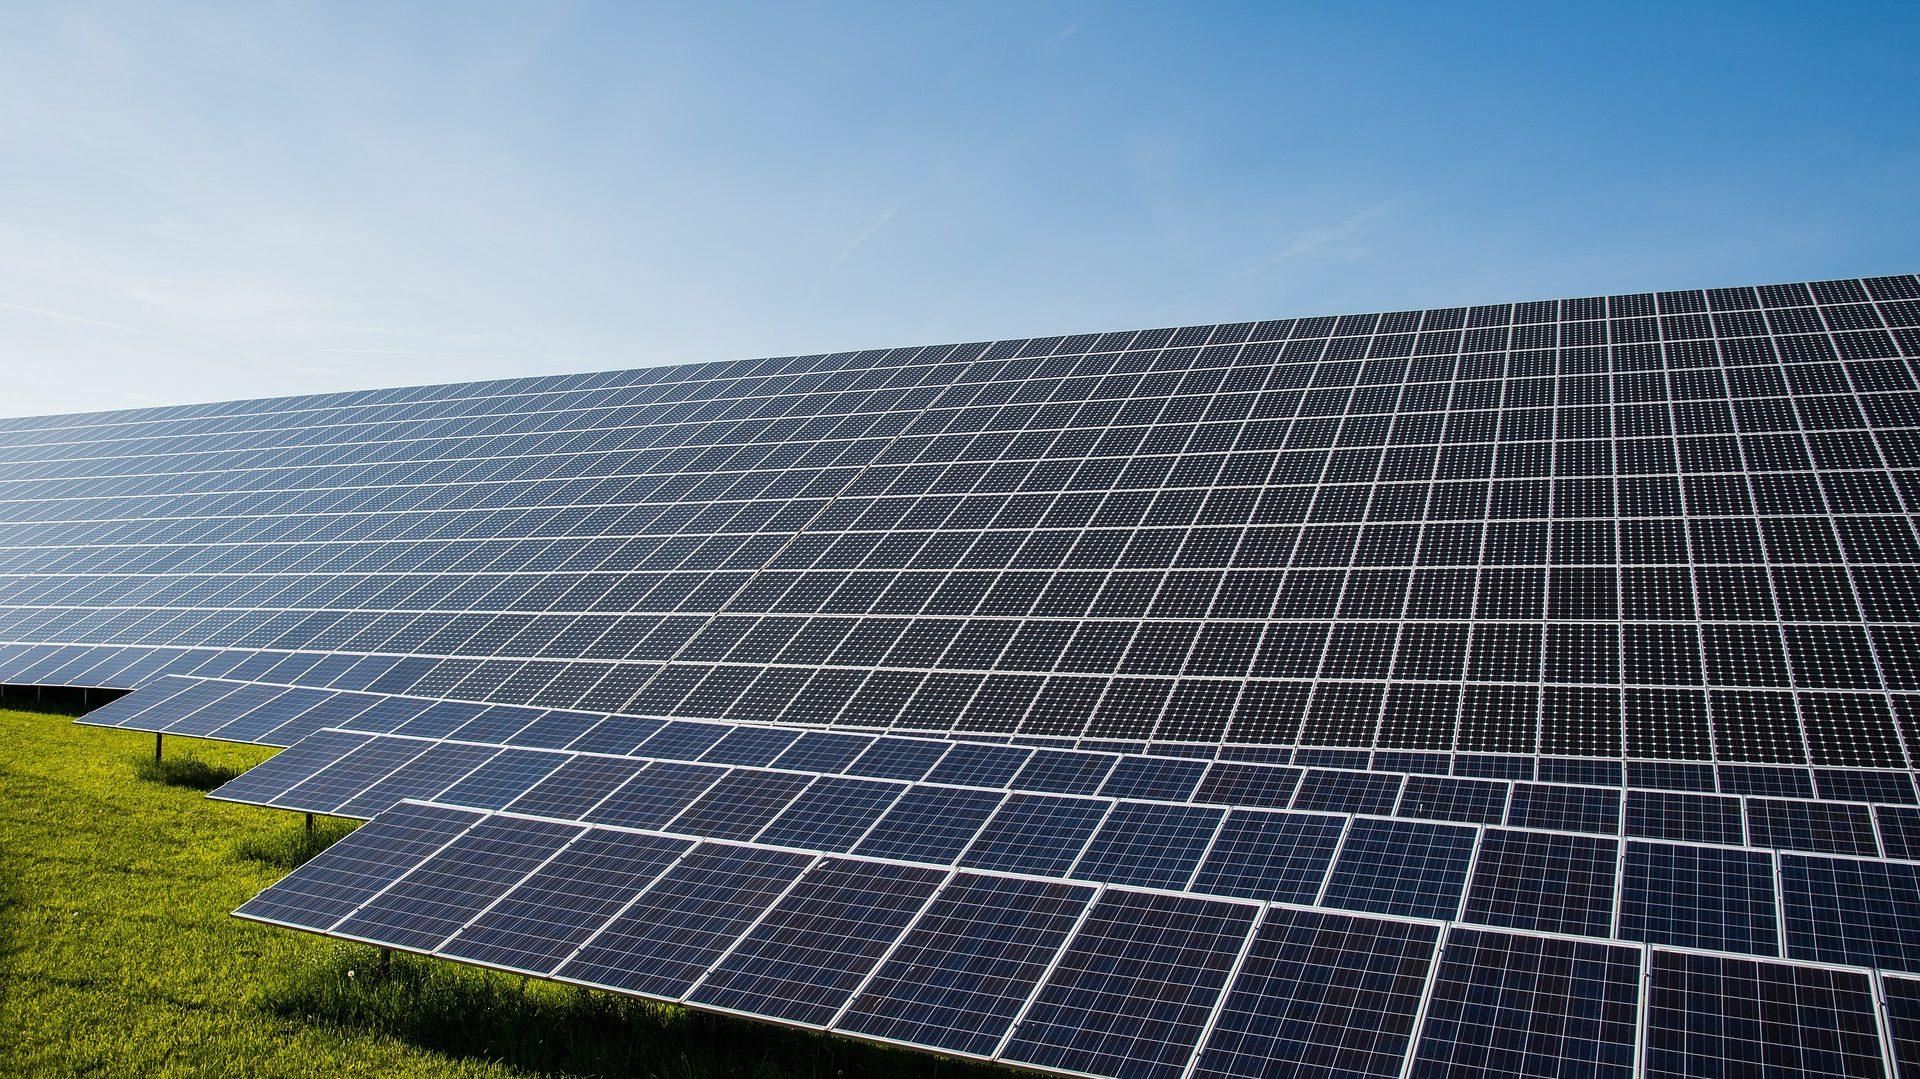 hundratals solceller